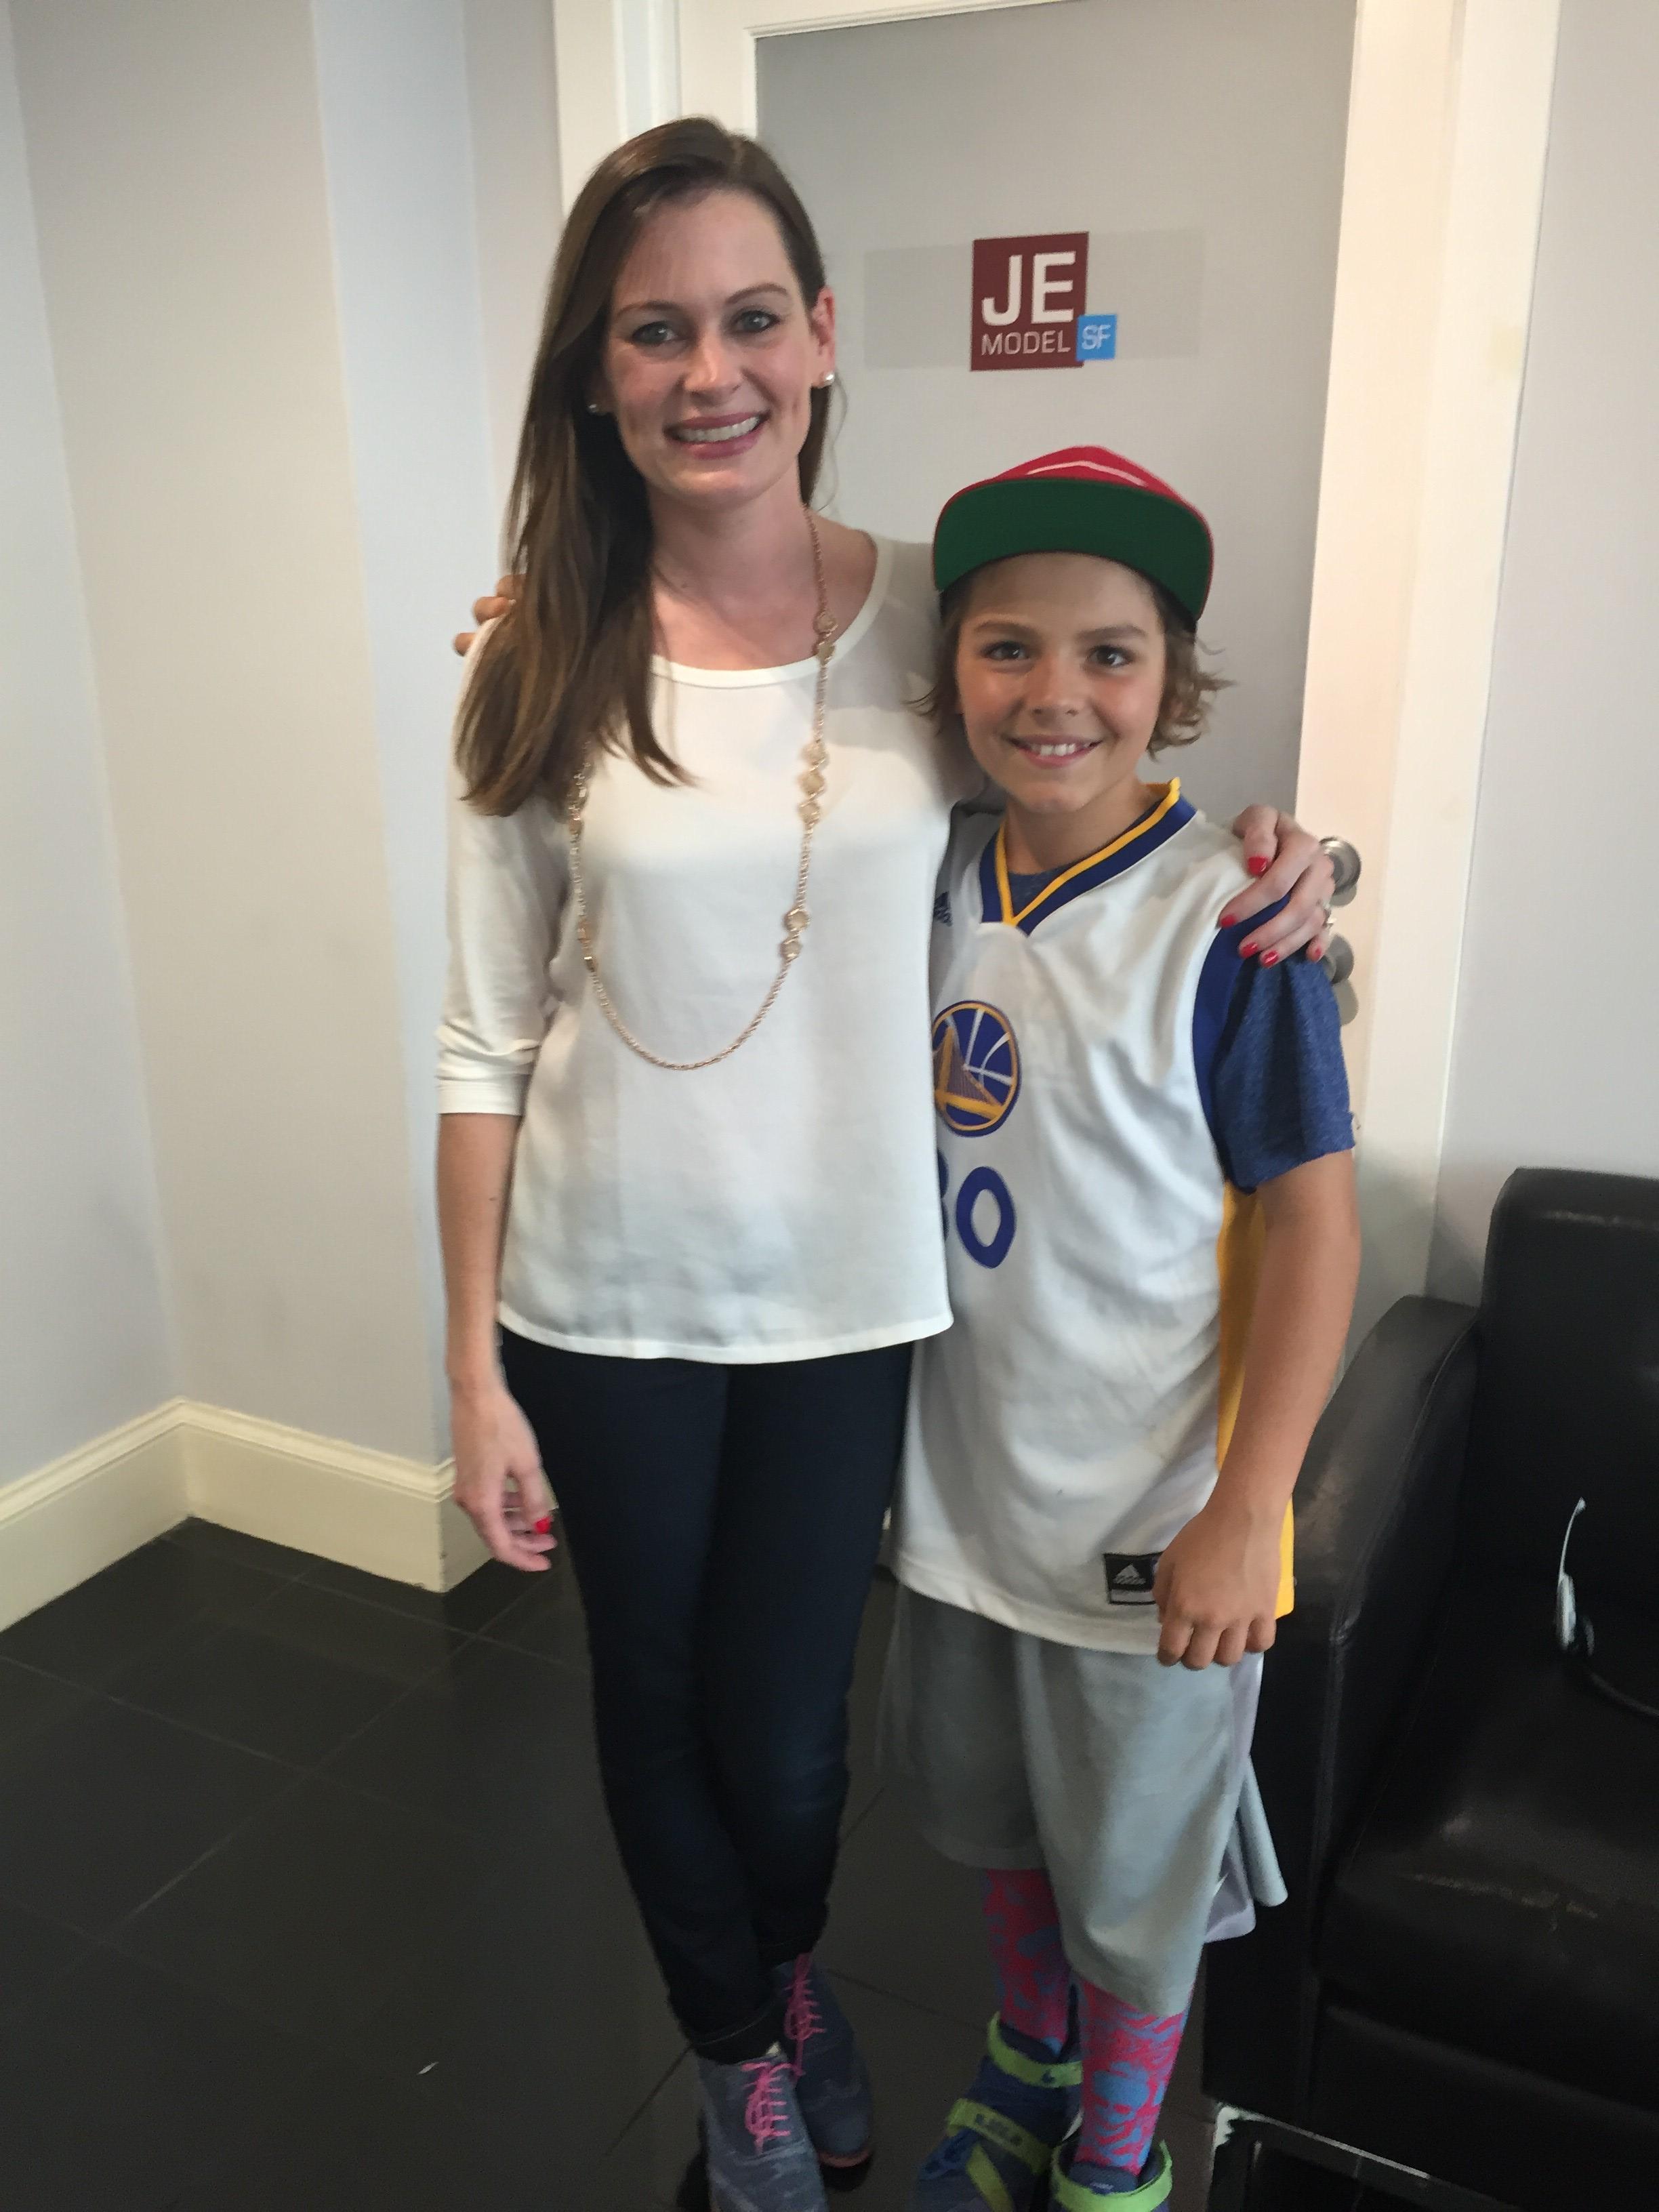 Shannon escoto, children's modeling agent